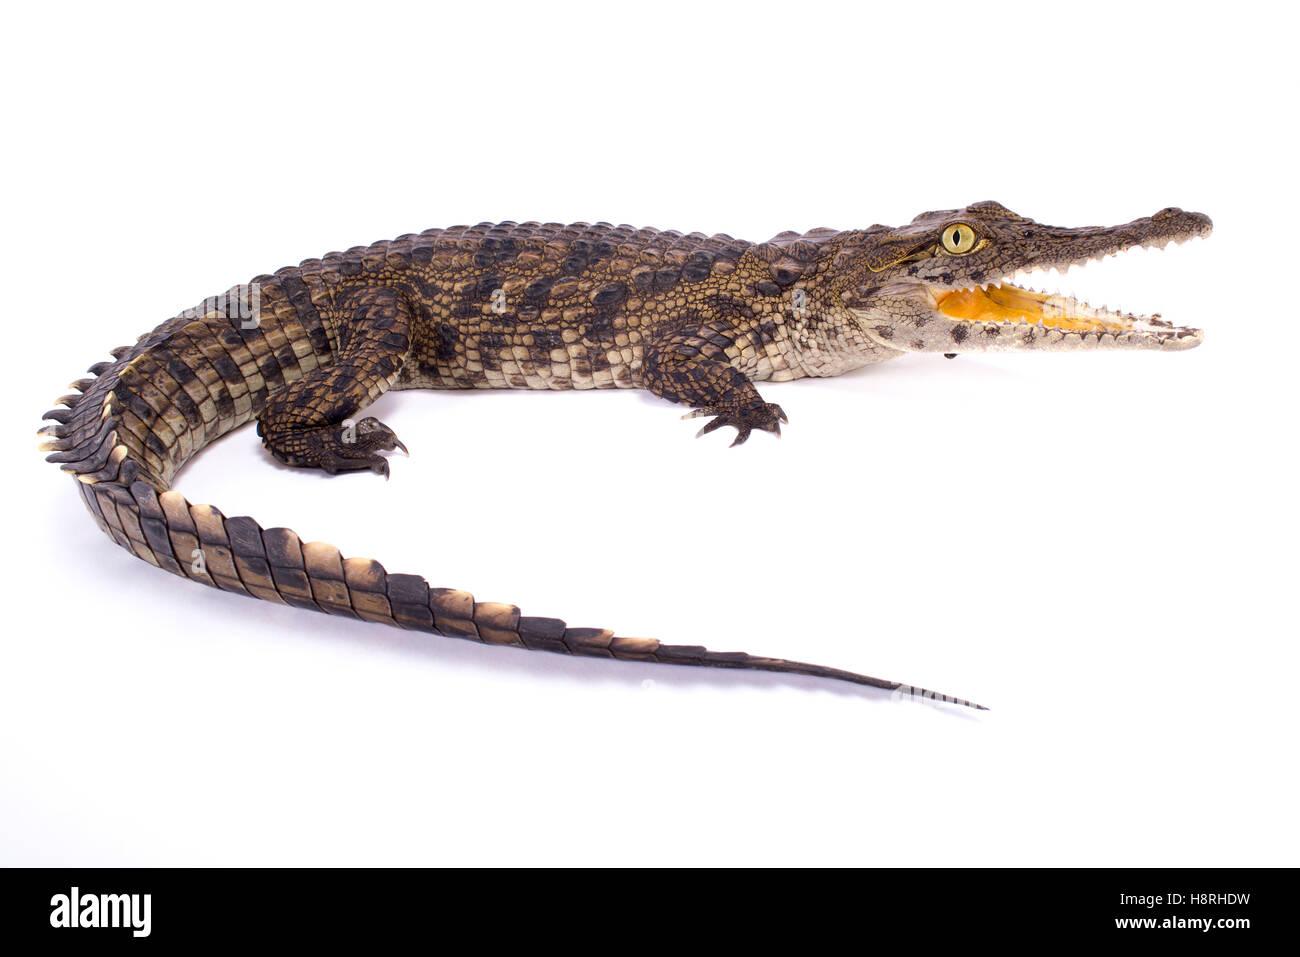 Nile crocodile,Crocodylus niloticus - Stock Image